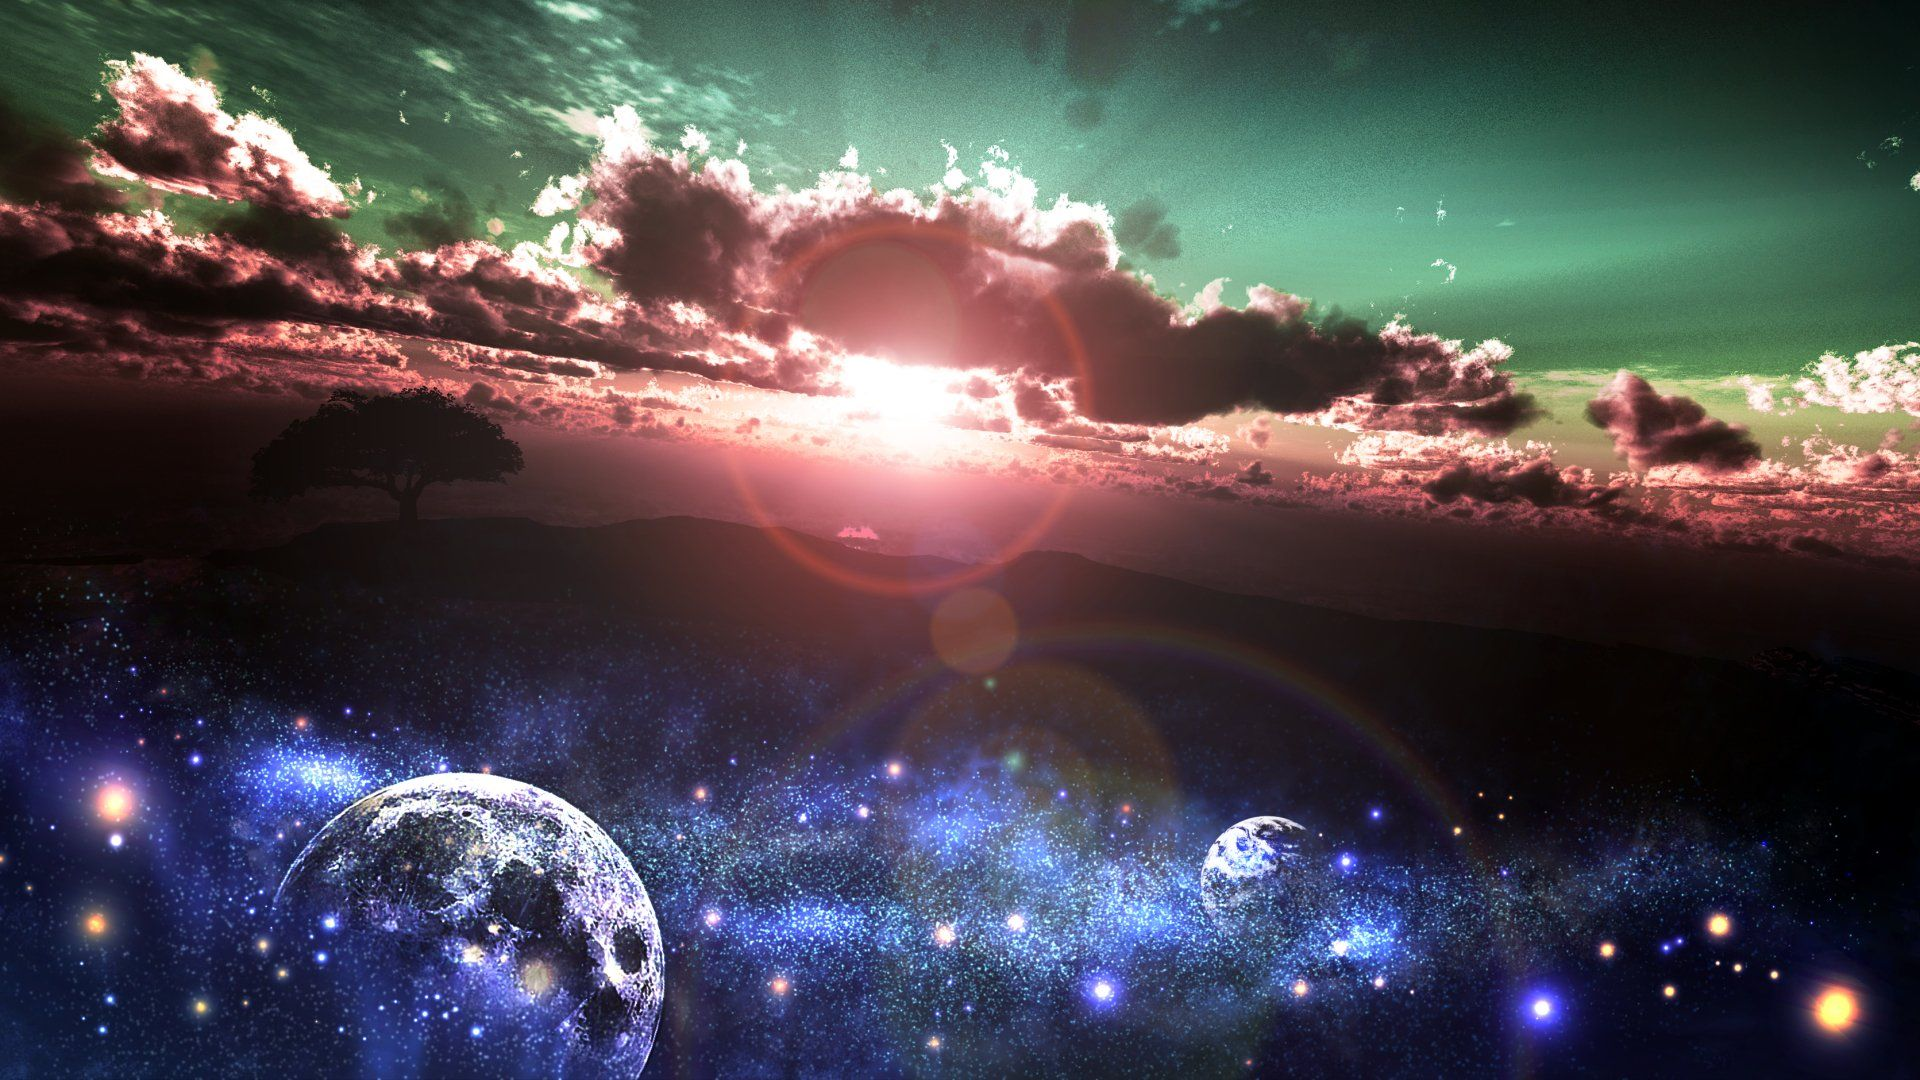 Anime Original Original Anime Space Sunrise Planet Sunbeam Cloud Sky Stars Blue Black Tree Wallpaper Fen Shuj Priroda Kosmos Anime space wallpaper 4k